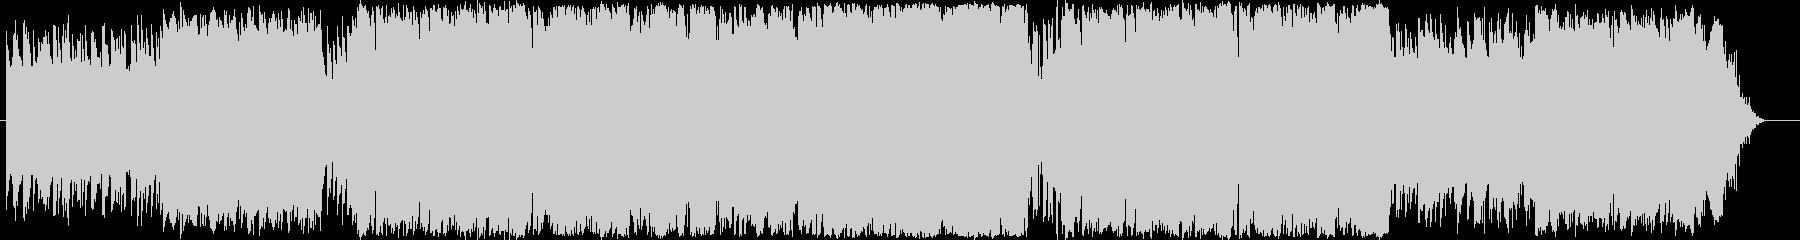 STG等のBGM用テクノの未再生の波形